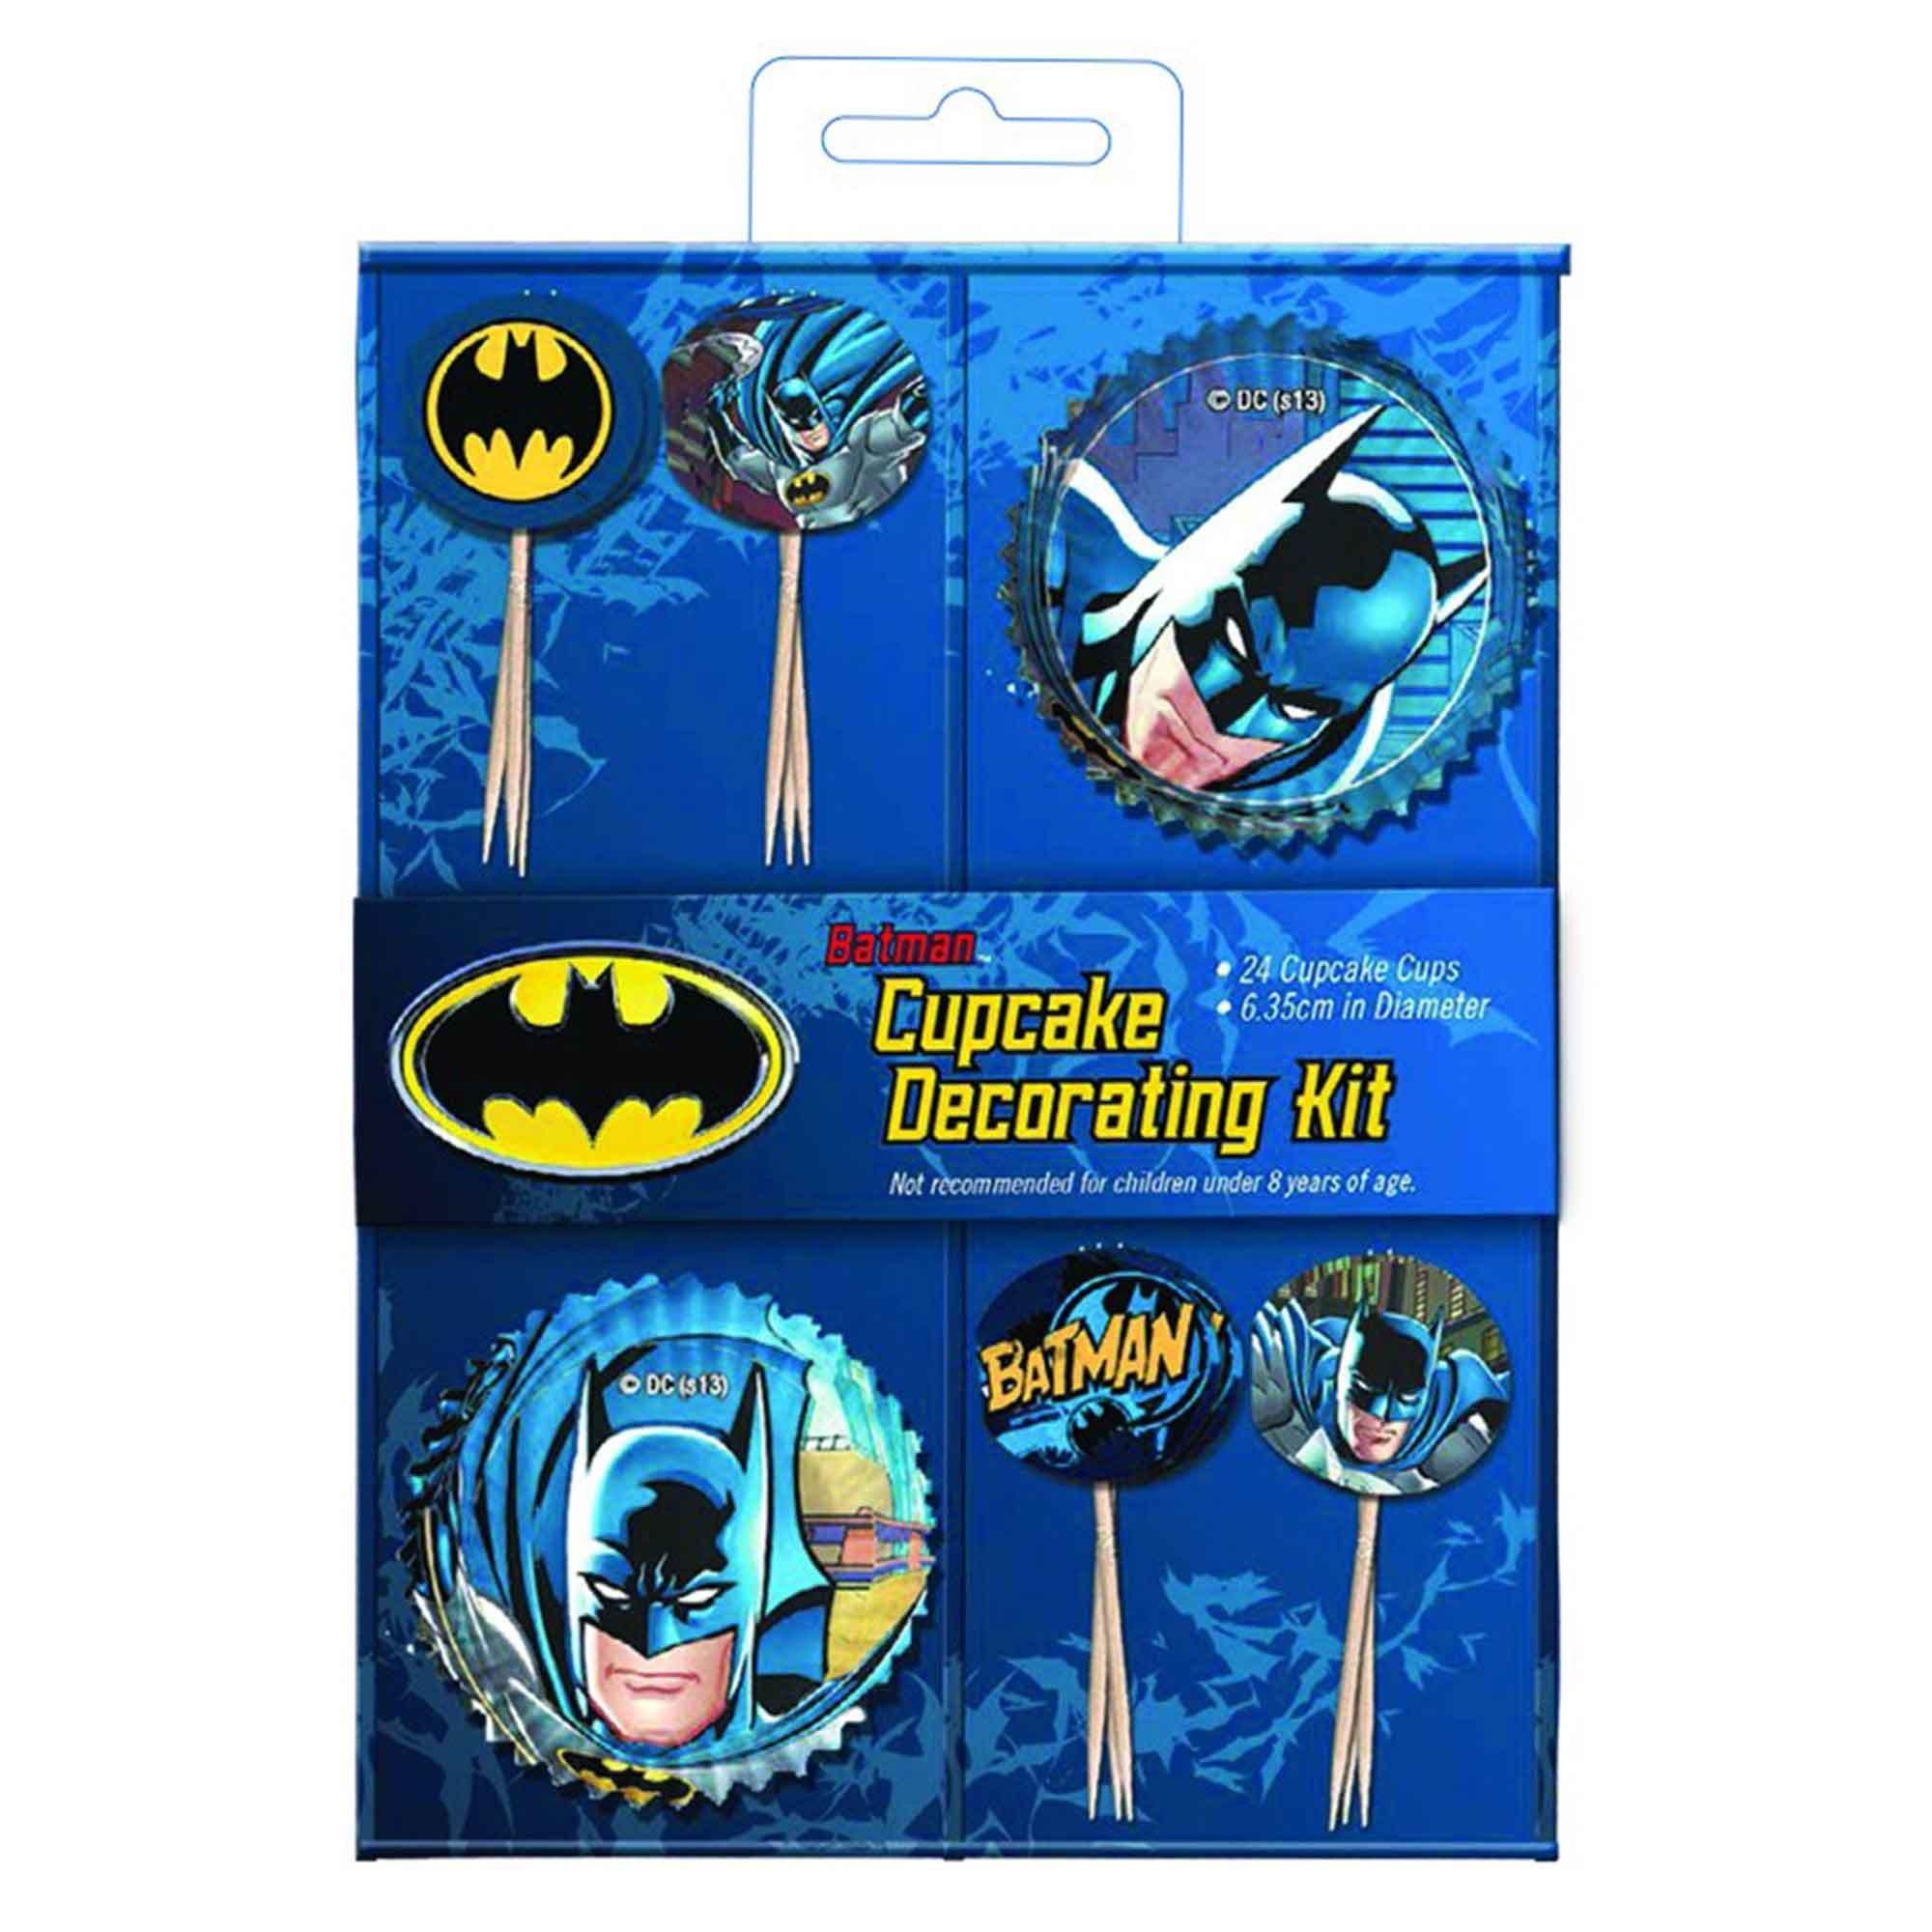 Batman Cupcake Decorations Kit